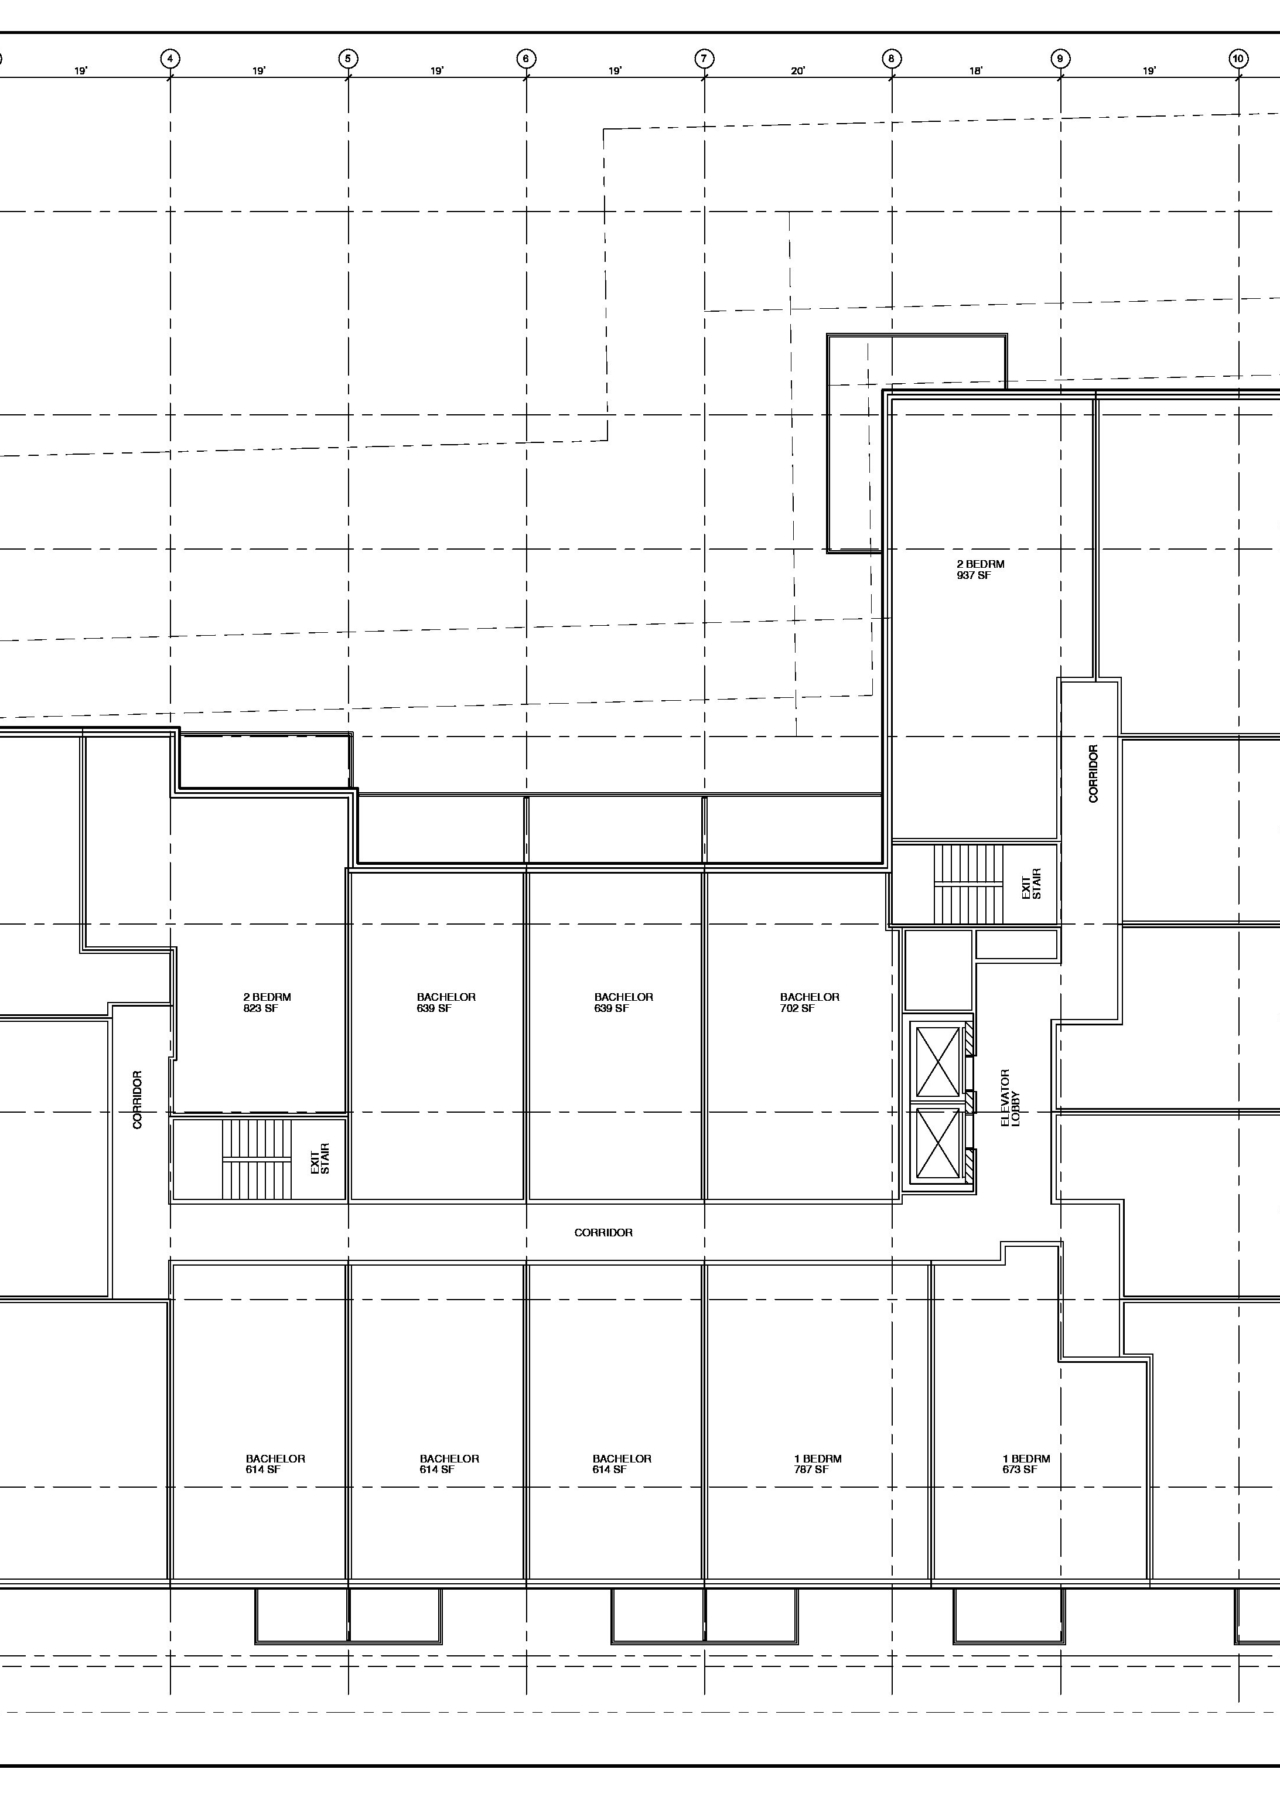 3093 A3 Floor Plan-A3.4